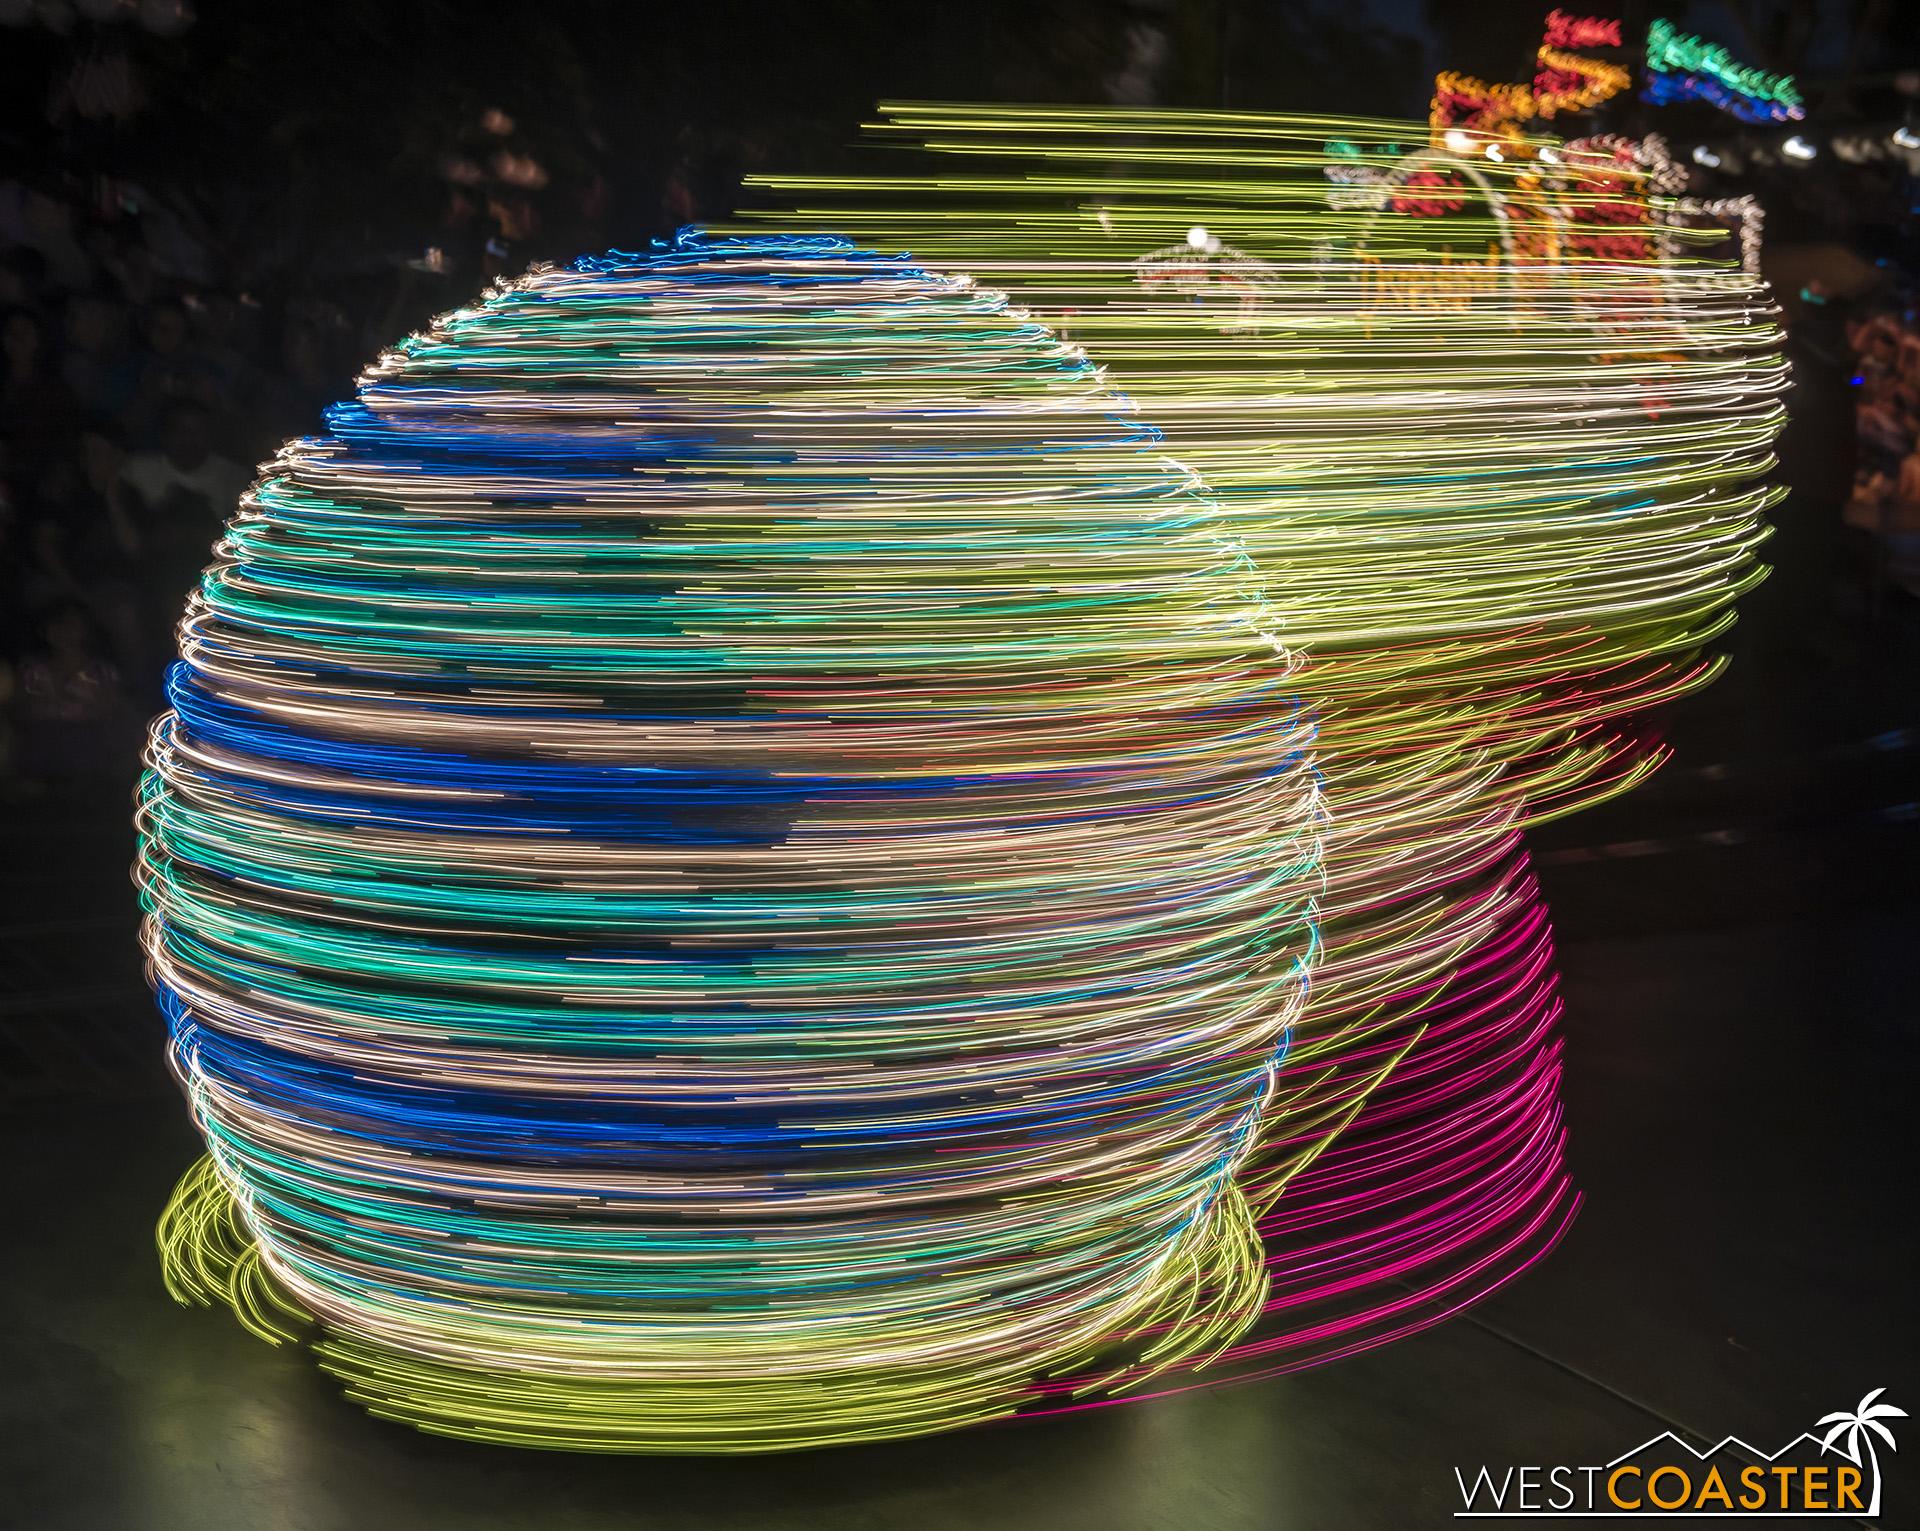 Spinny spinny!